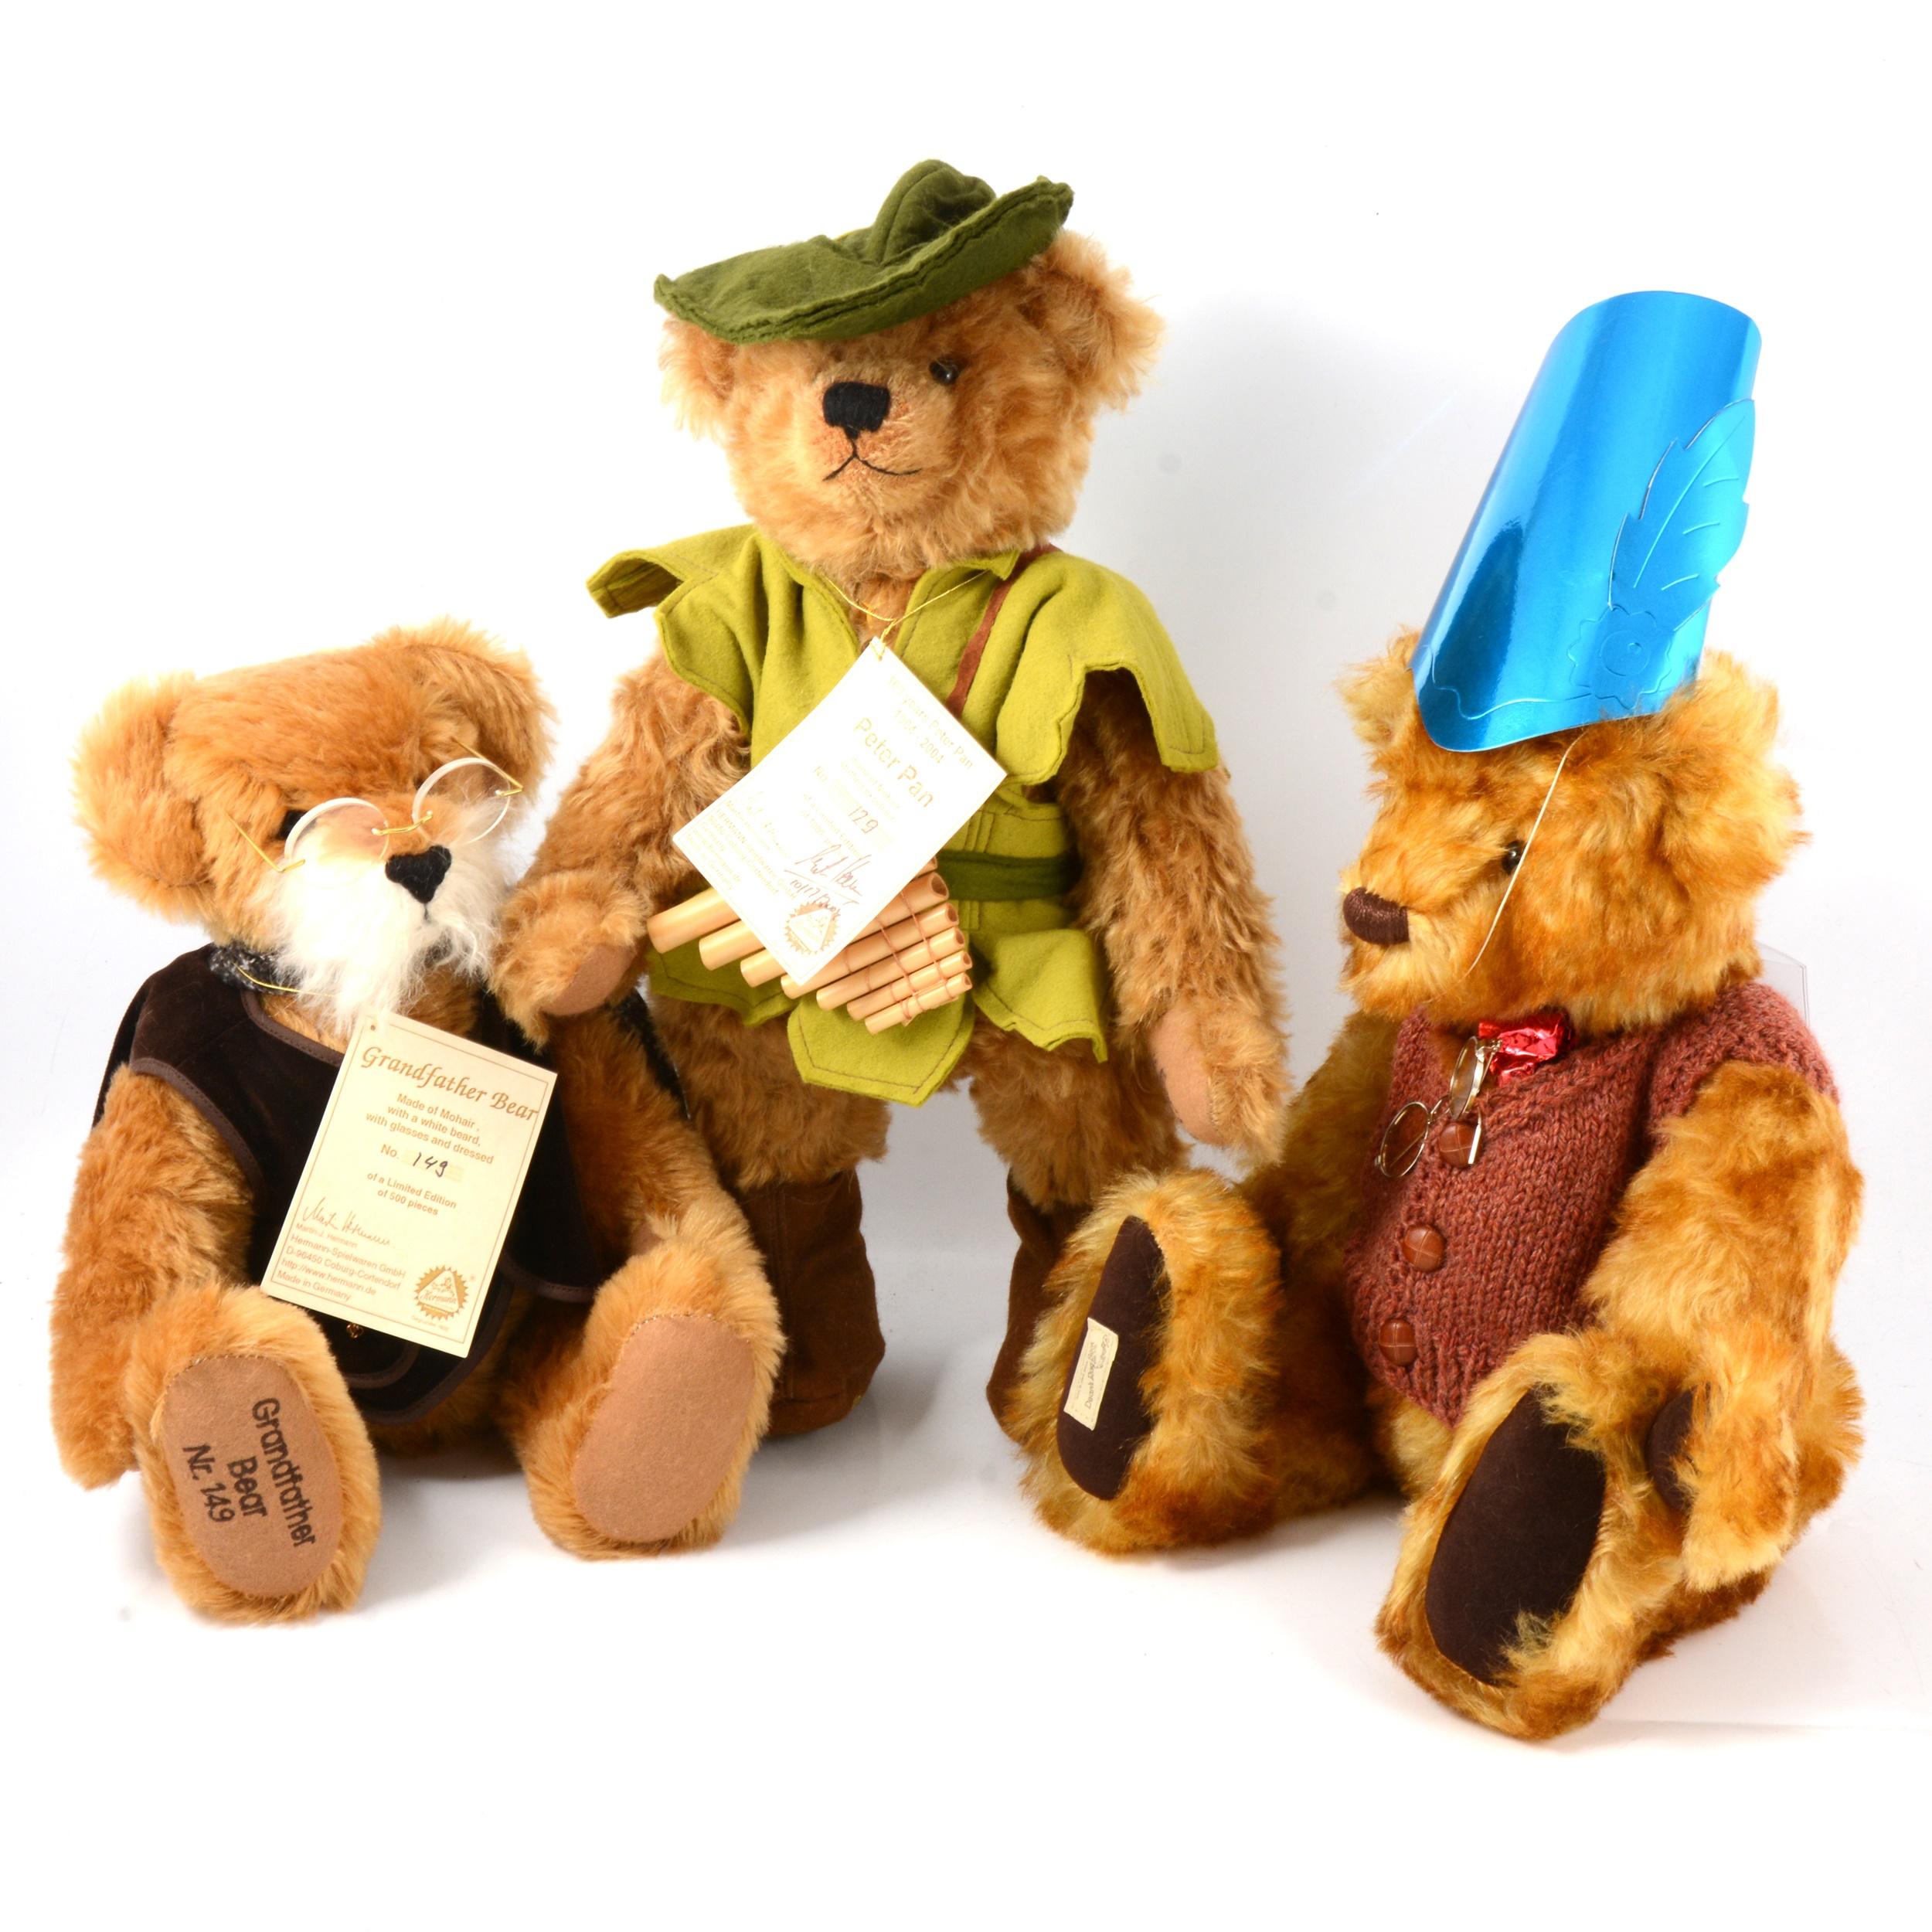 Hermann-Spielwaren mohair teddy bears and a Dean's Rag Book bear.